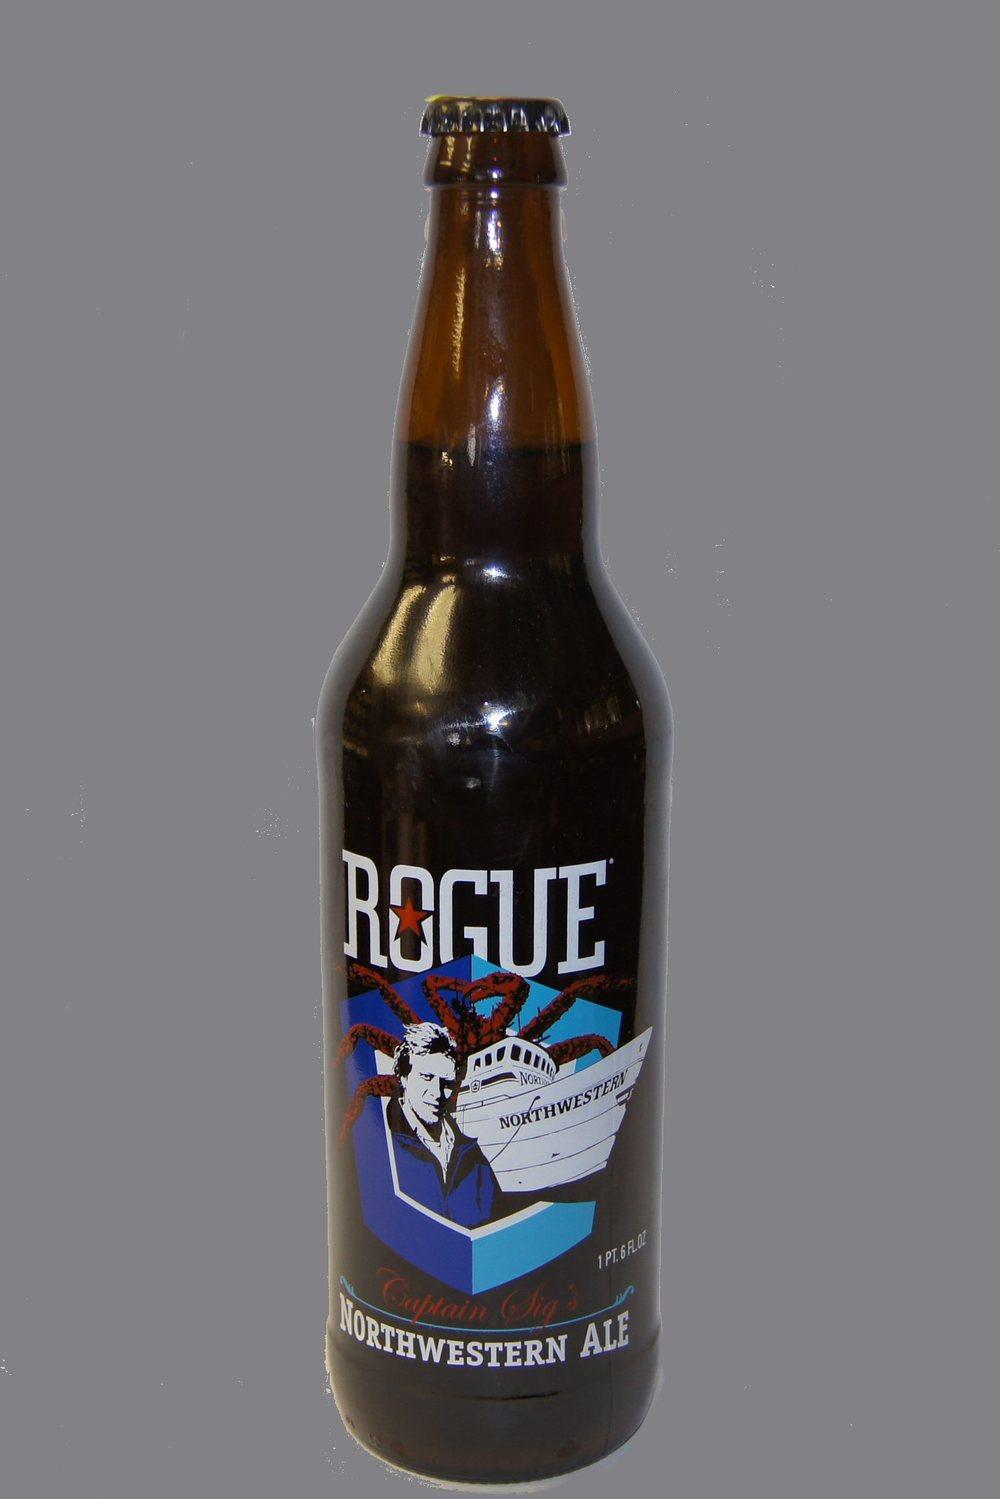 ROGUE-Northwestern Ale.jpg